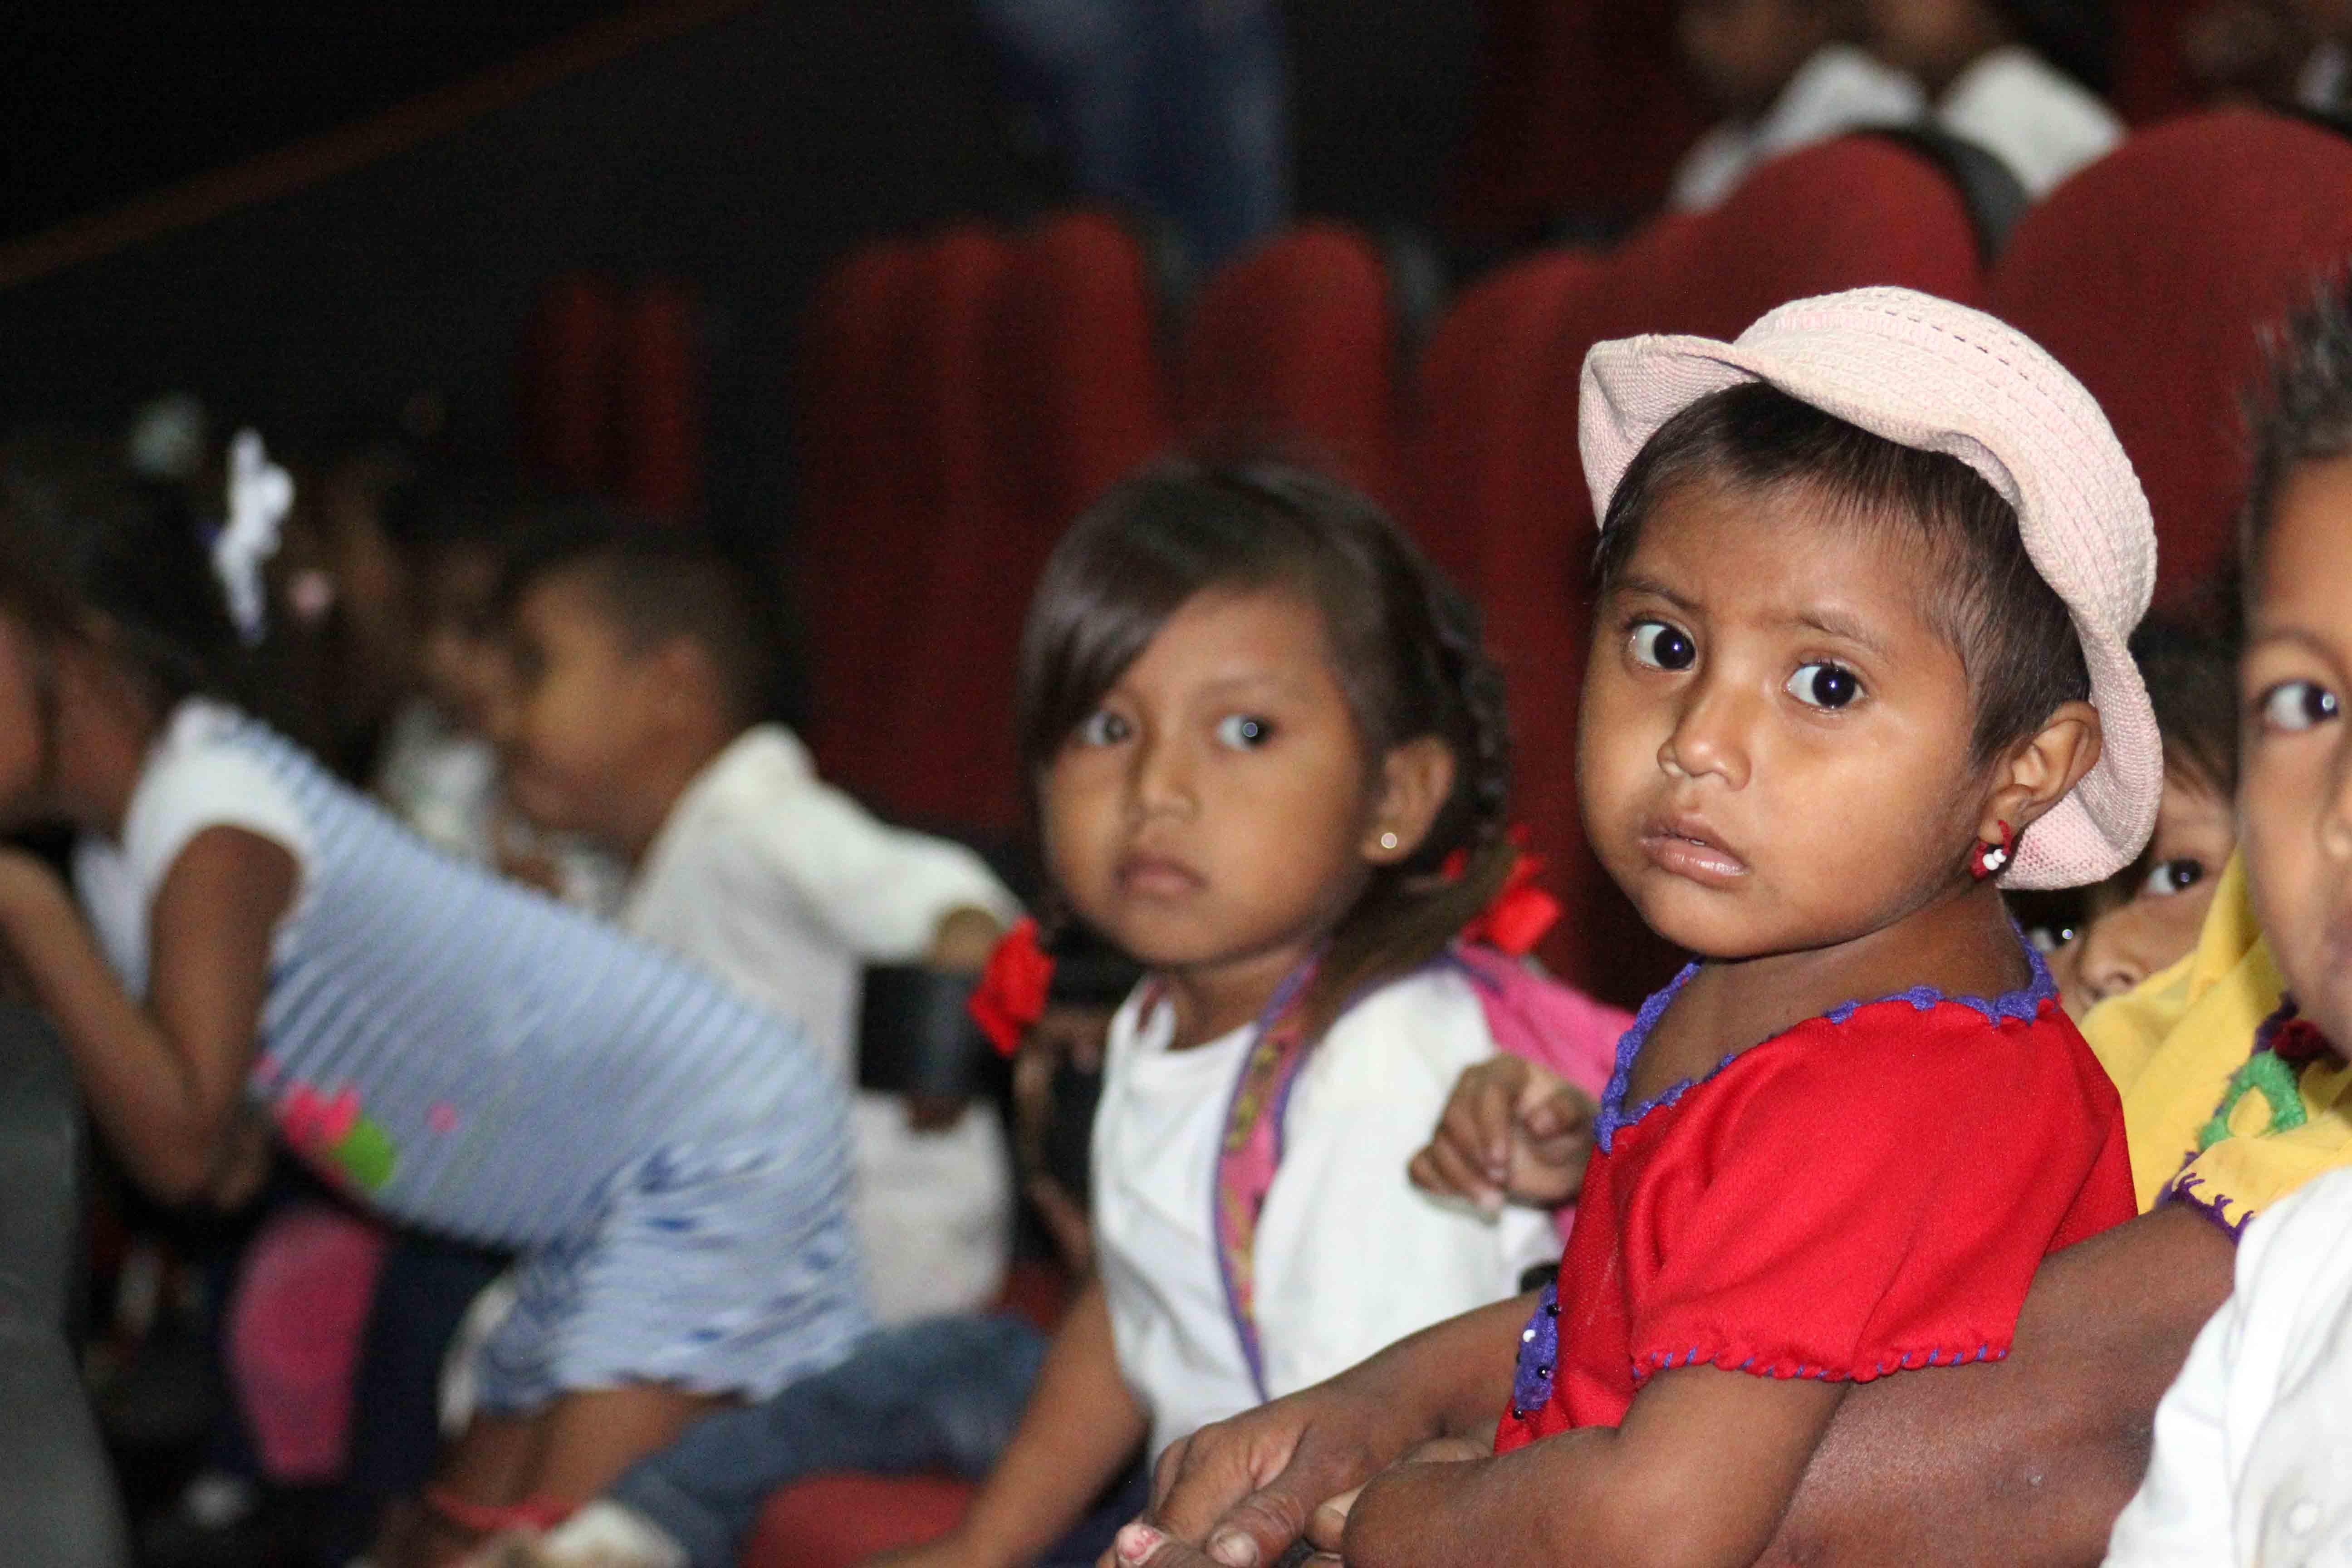 Gmcp garantiza Navidades Felices a través de cine-foro y entrega de juguetes (7)